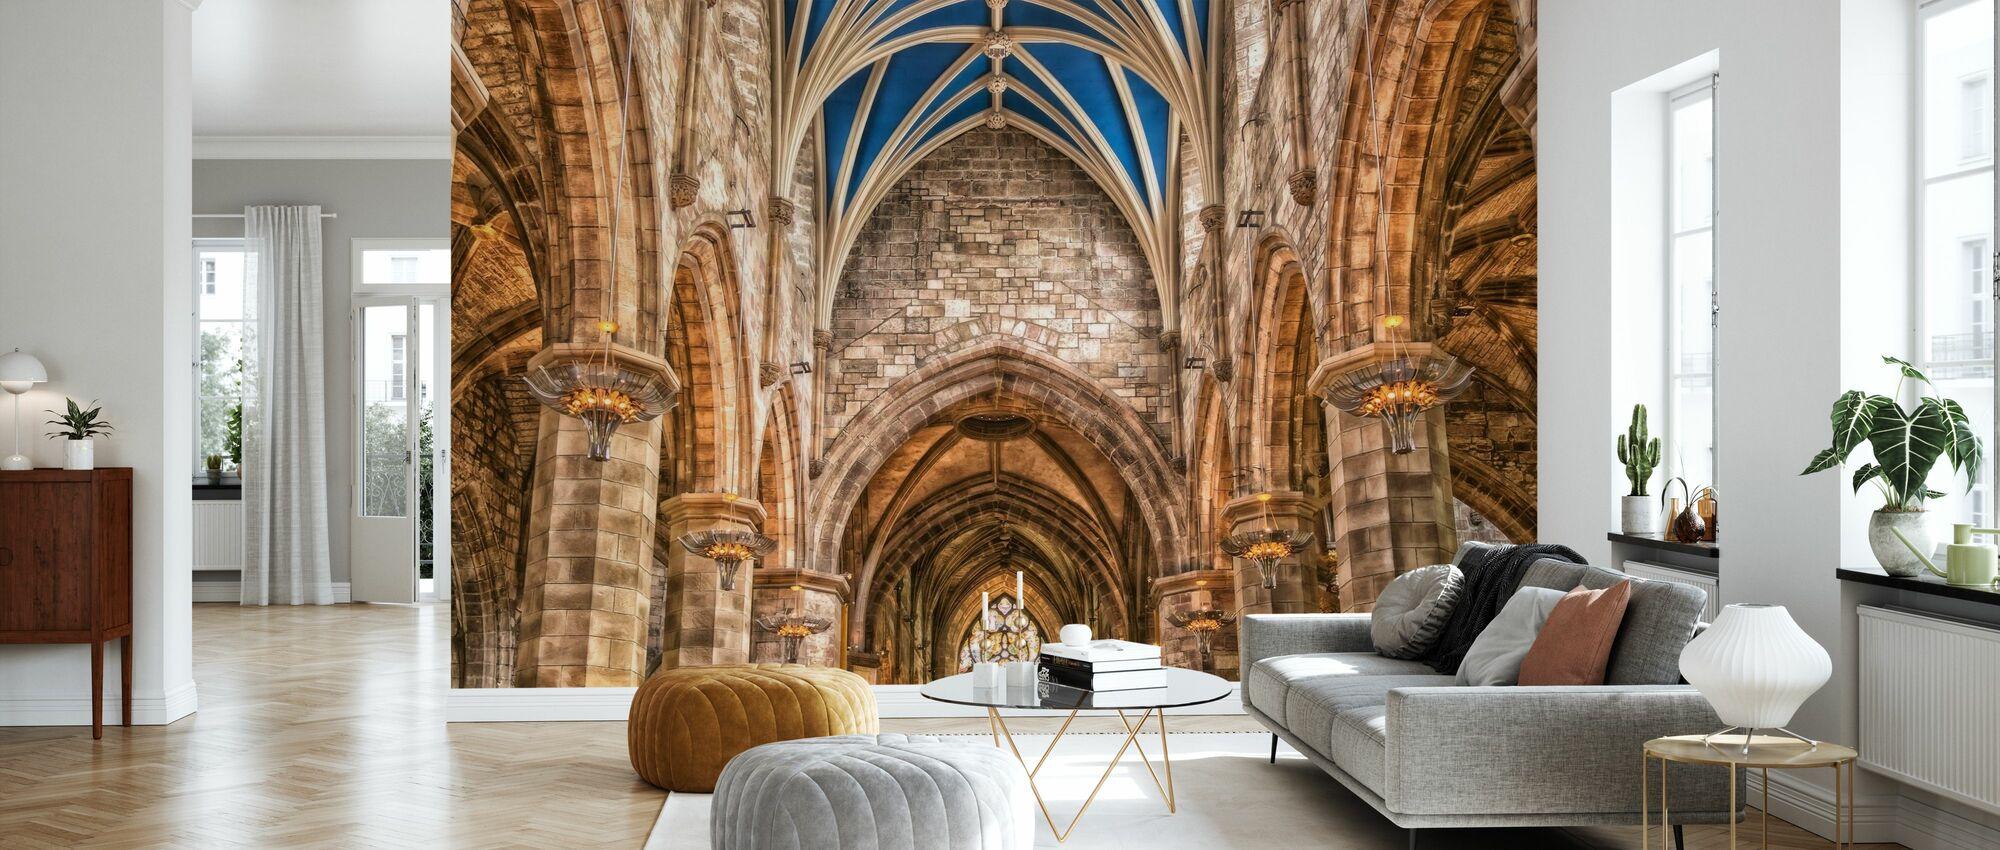 Cathedral Pillars - Wallpaper - Living Room